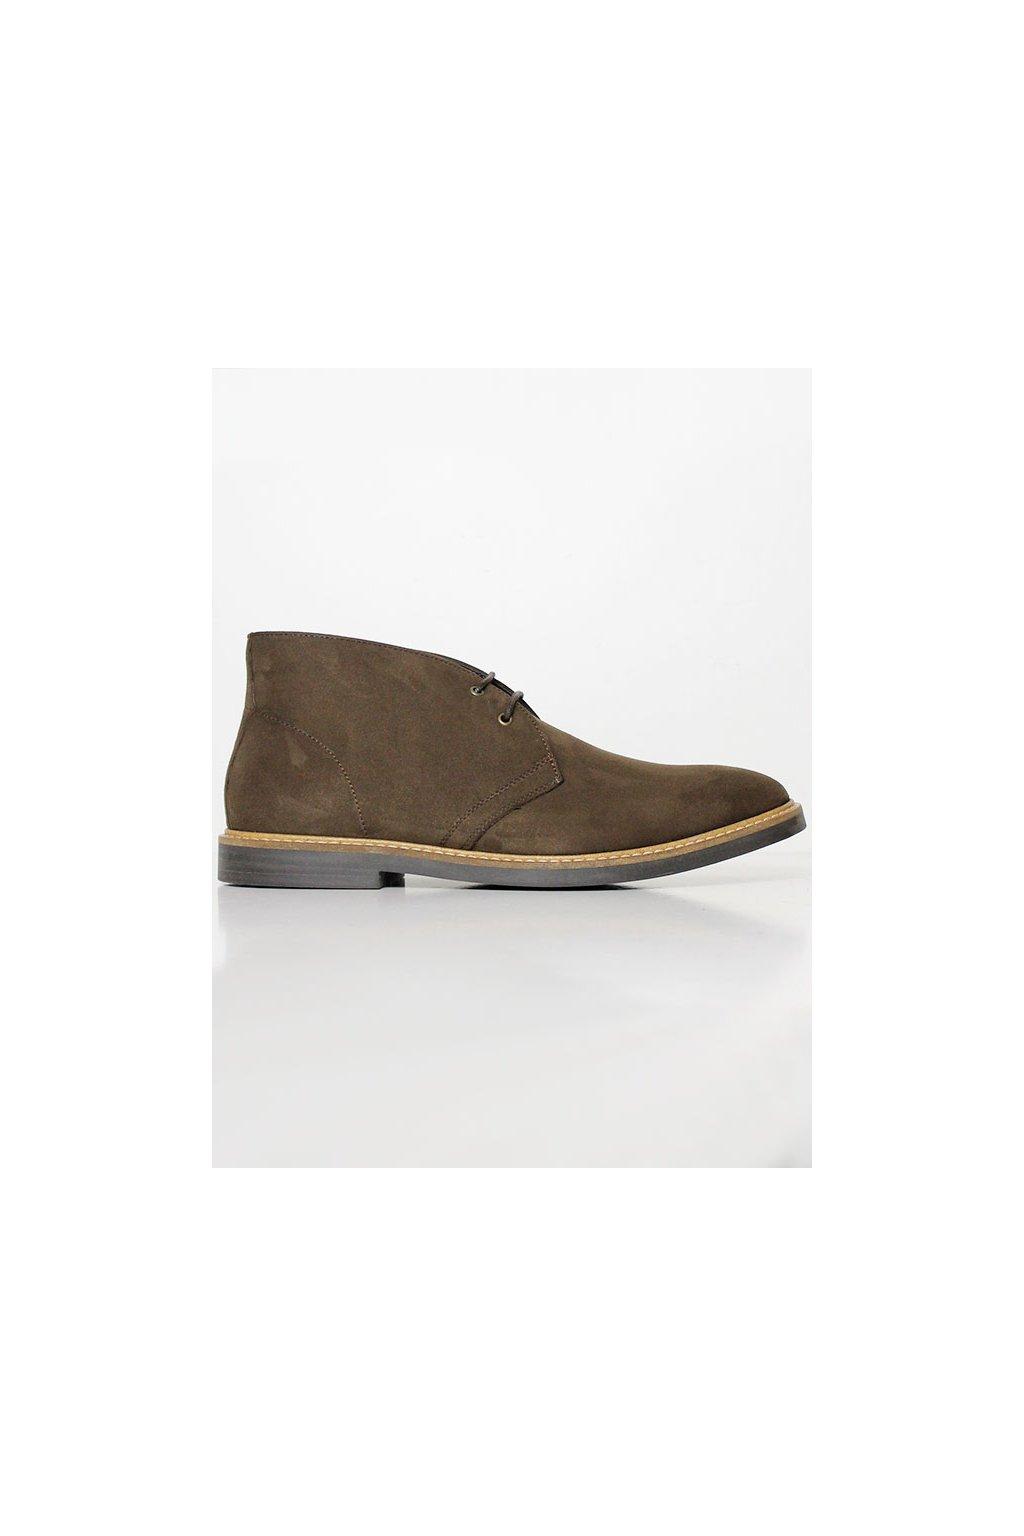 "Pánske členkové topánky ""Signature Deserts Brown"" - starý model"